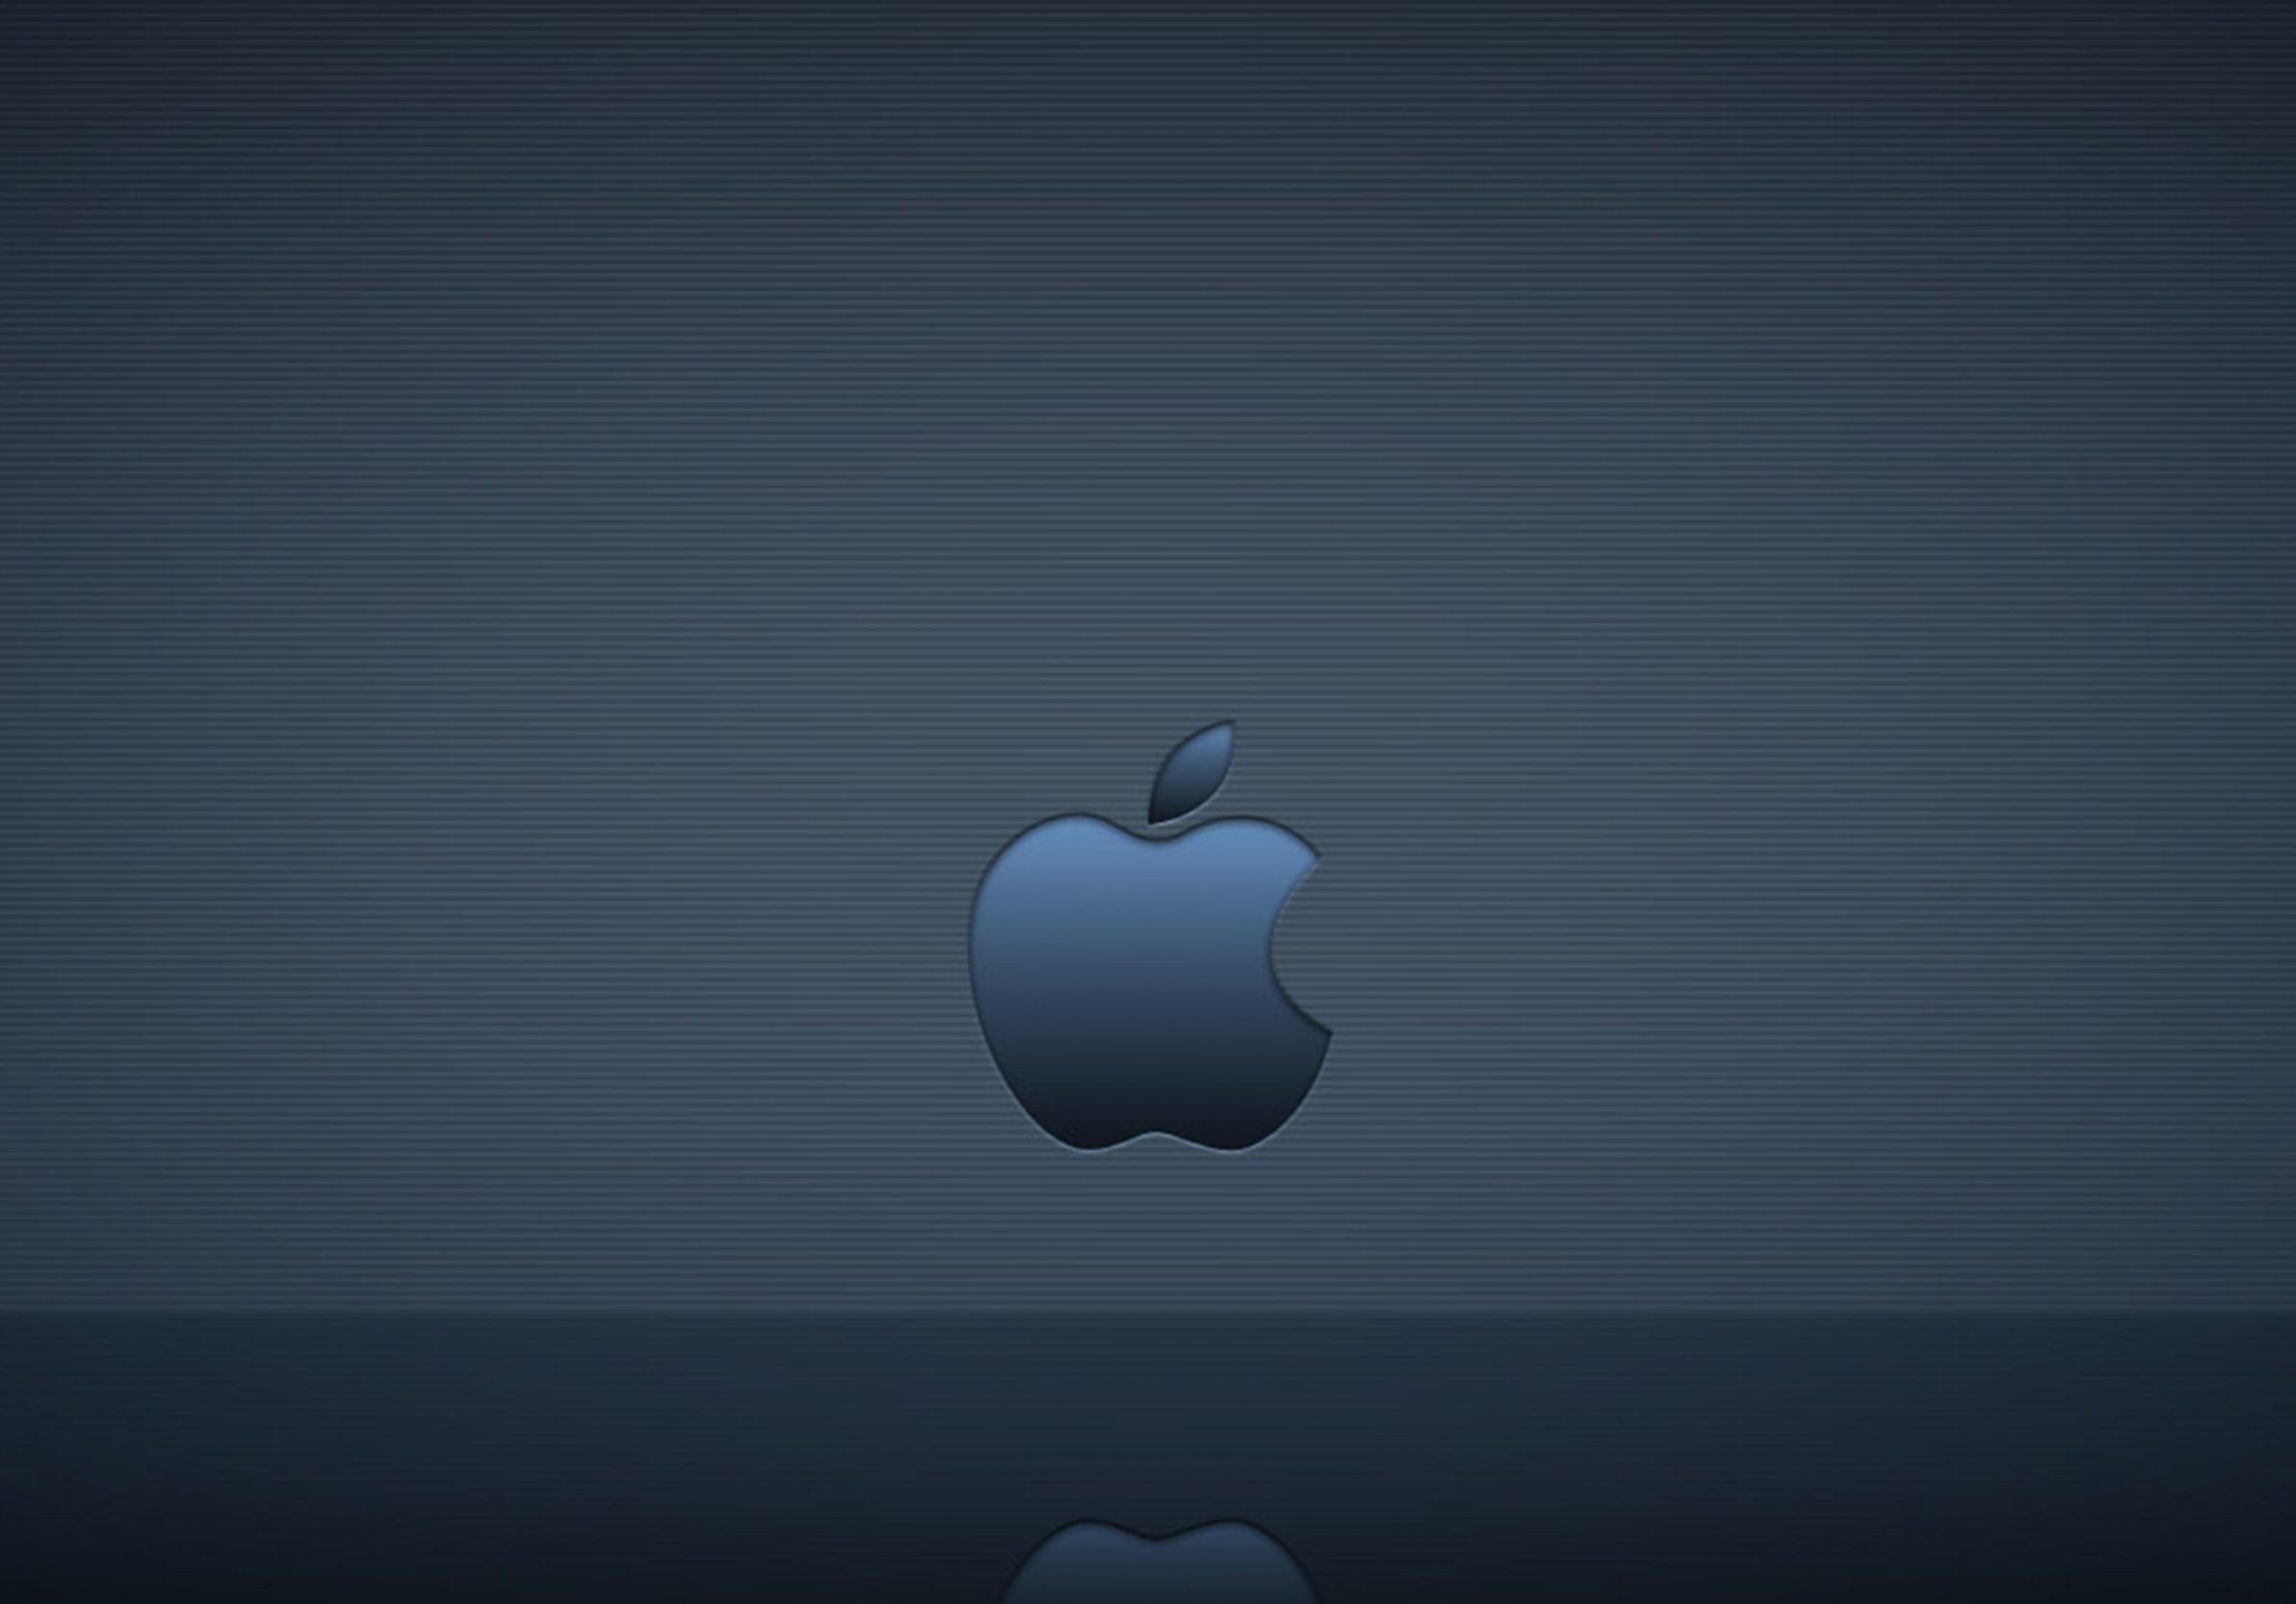 2388x1668 iPad Pro wallpapers Apple Logo Reflection Ipad Wallpaper 2388x1668 pixels resolution